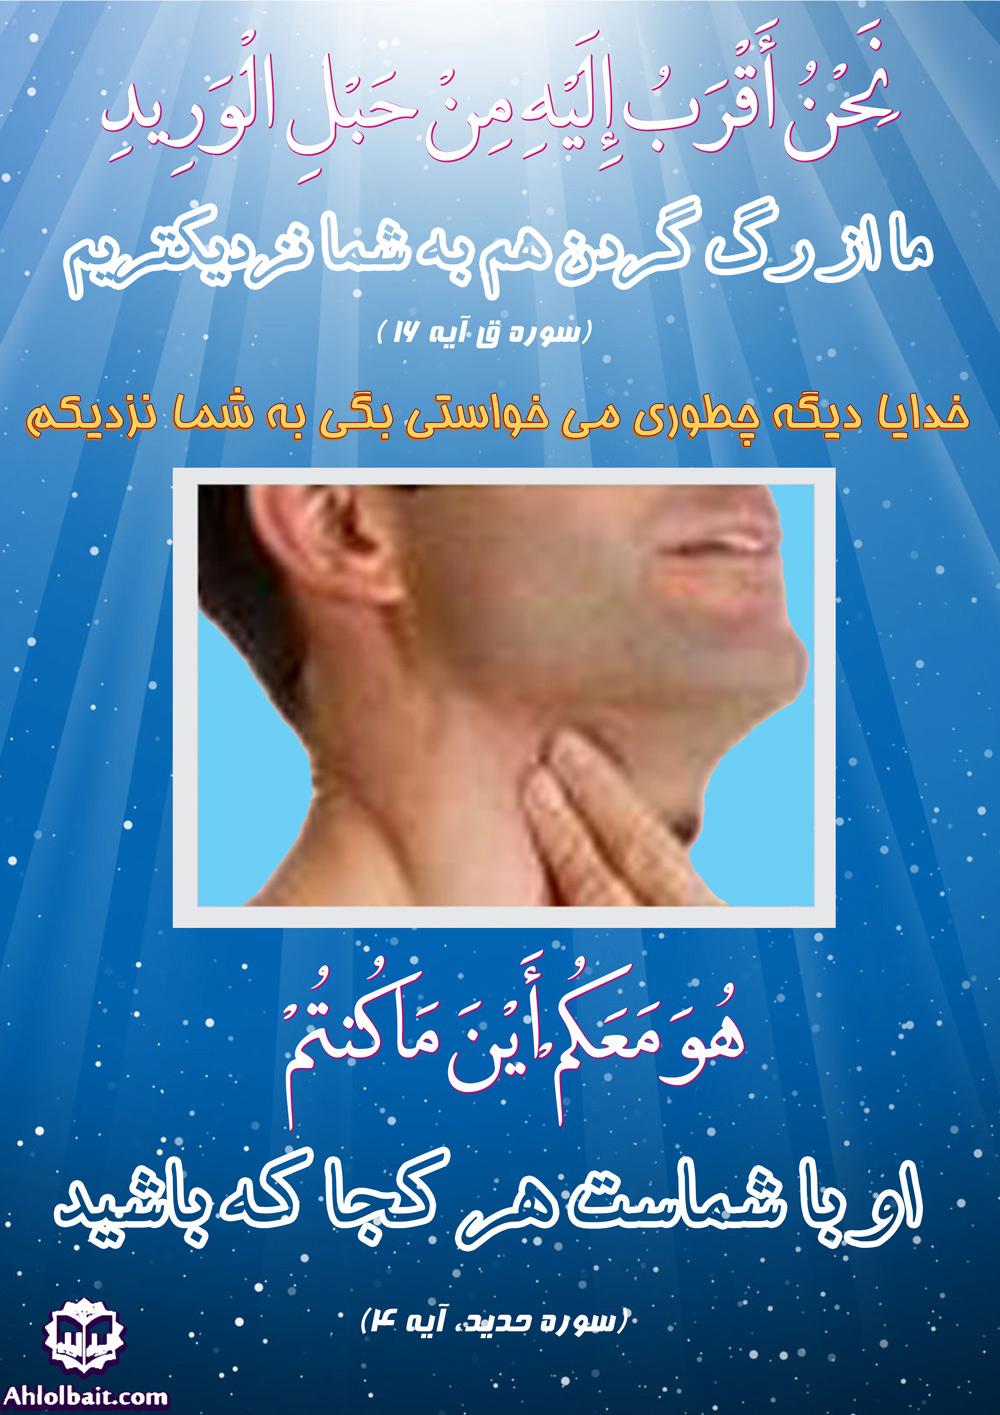 http://ahlolbait.com/files/u947/ba-khoda-boodan_0.jpg